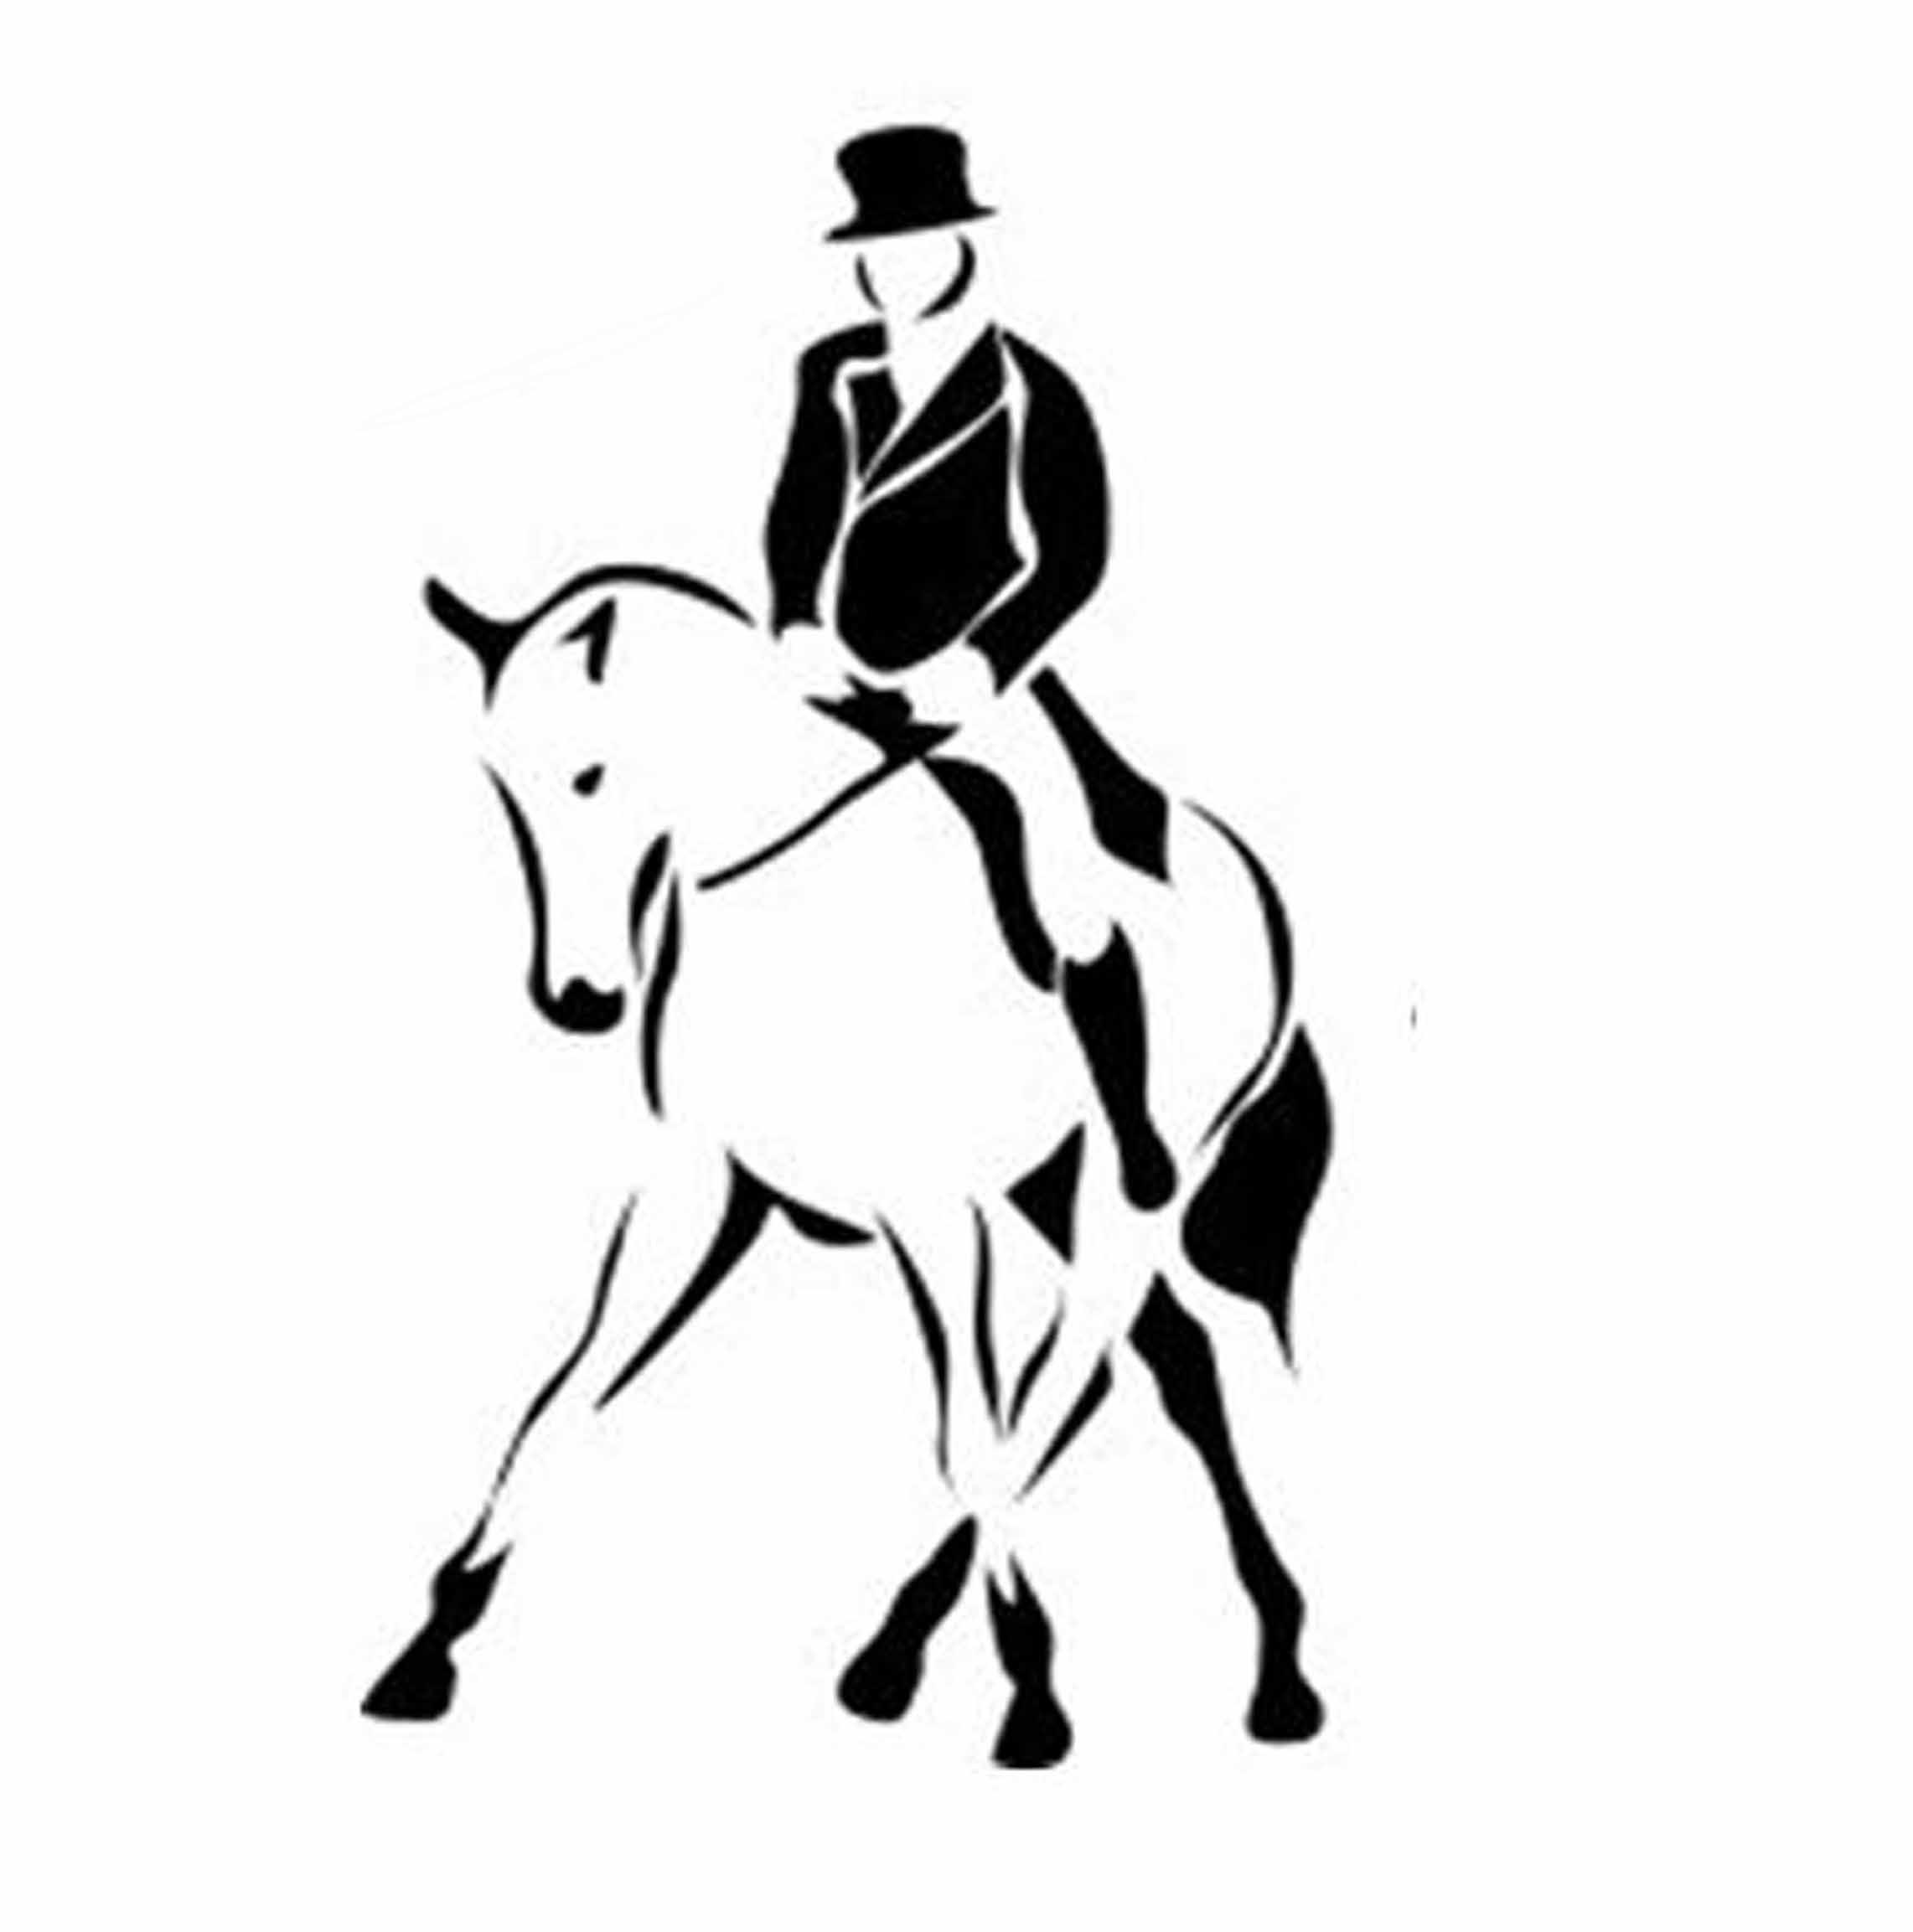 Dressage Horse Rider Silhouette Clip Art Free Image